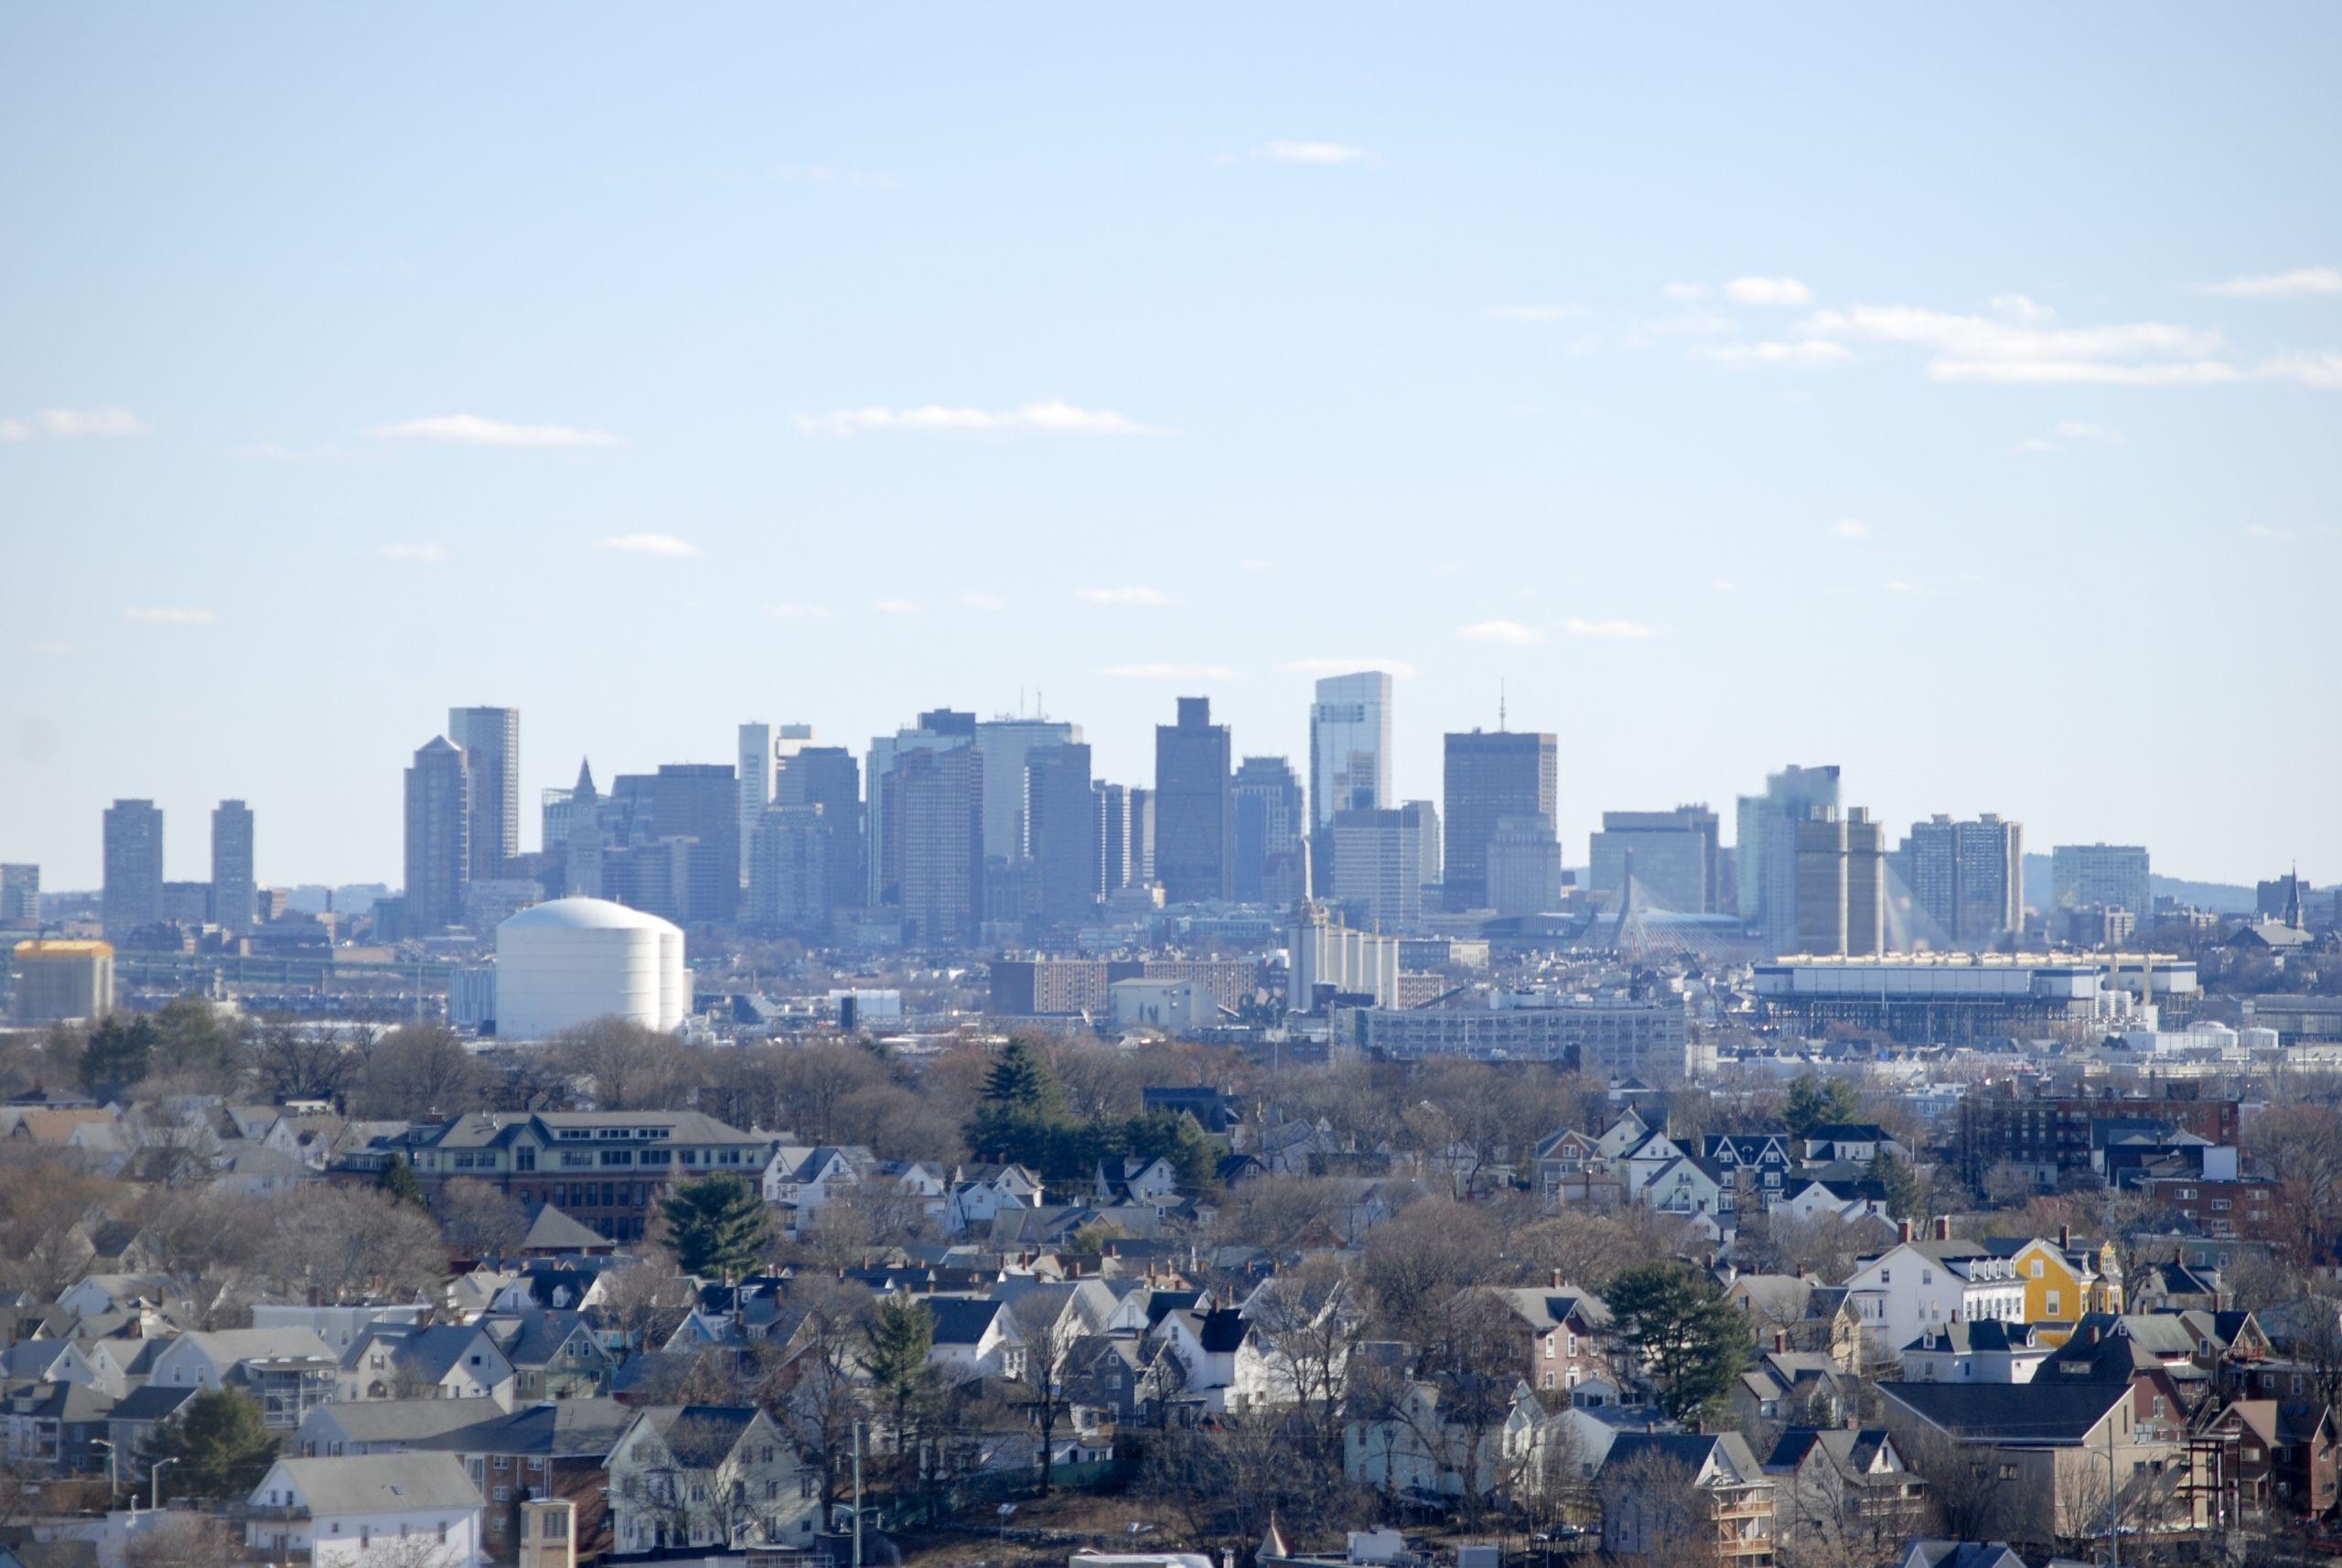 Boston skyline over Malden, MA